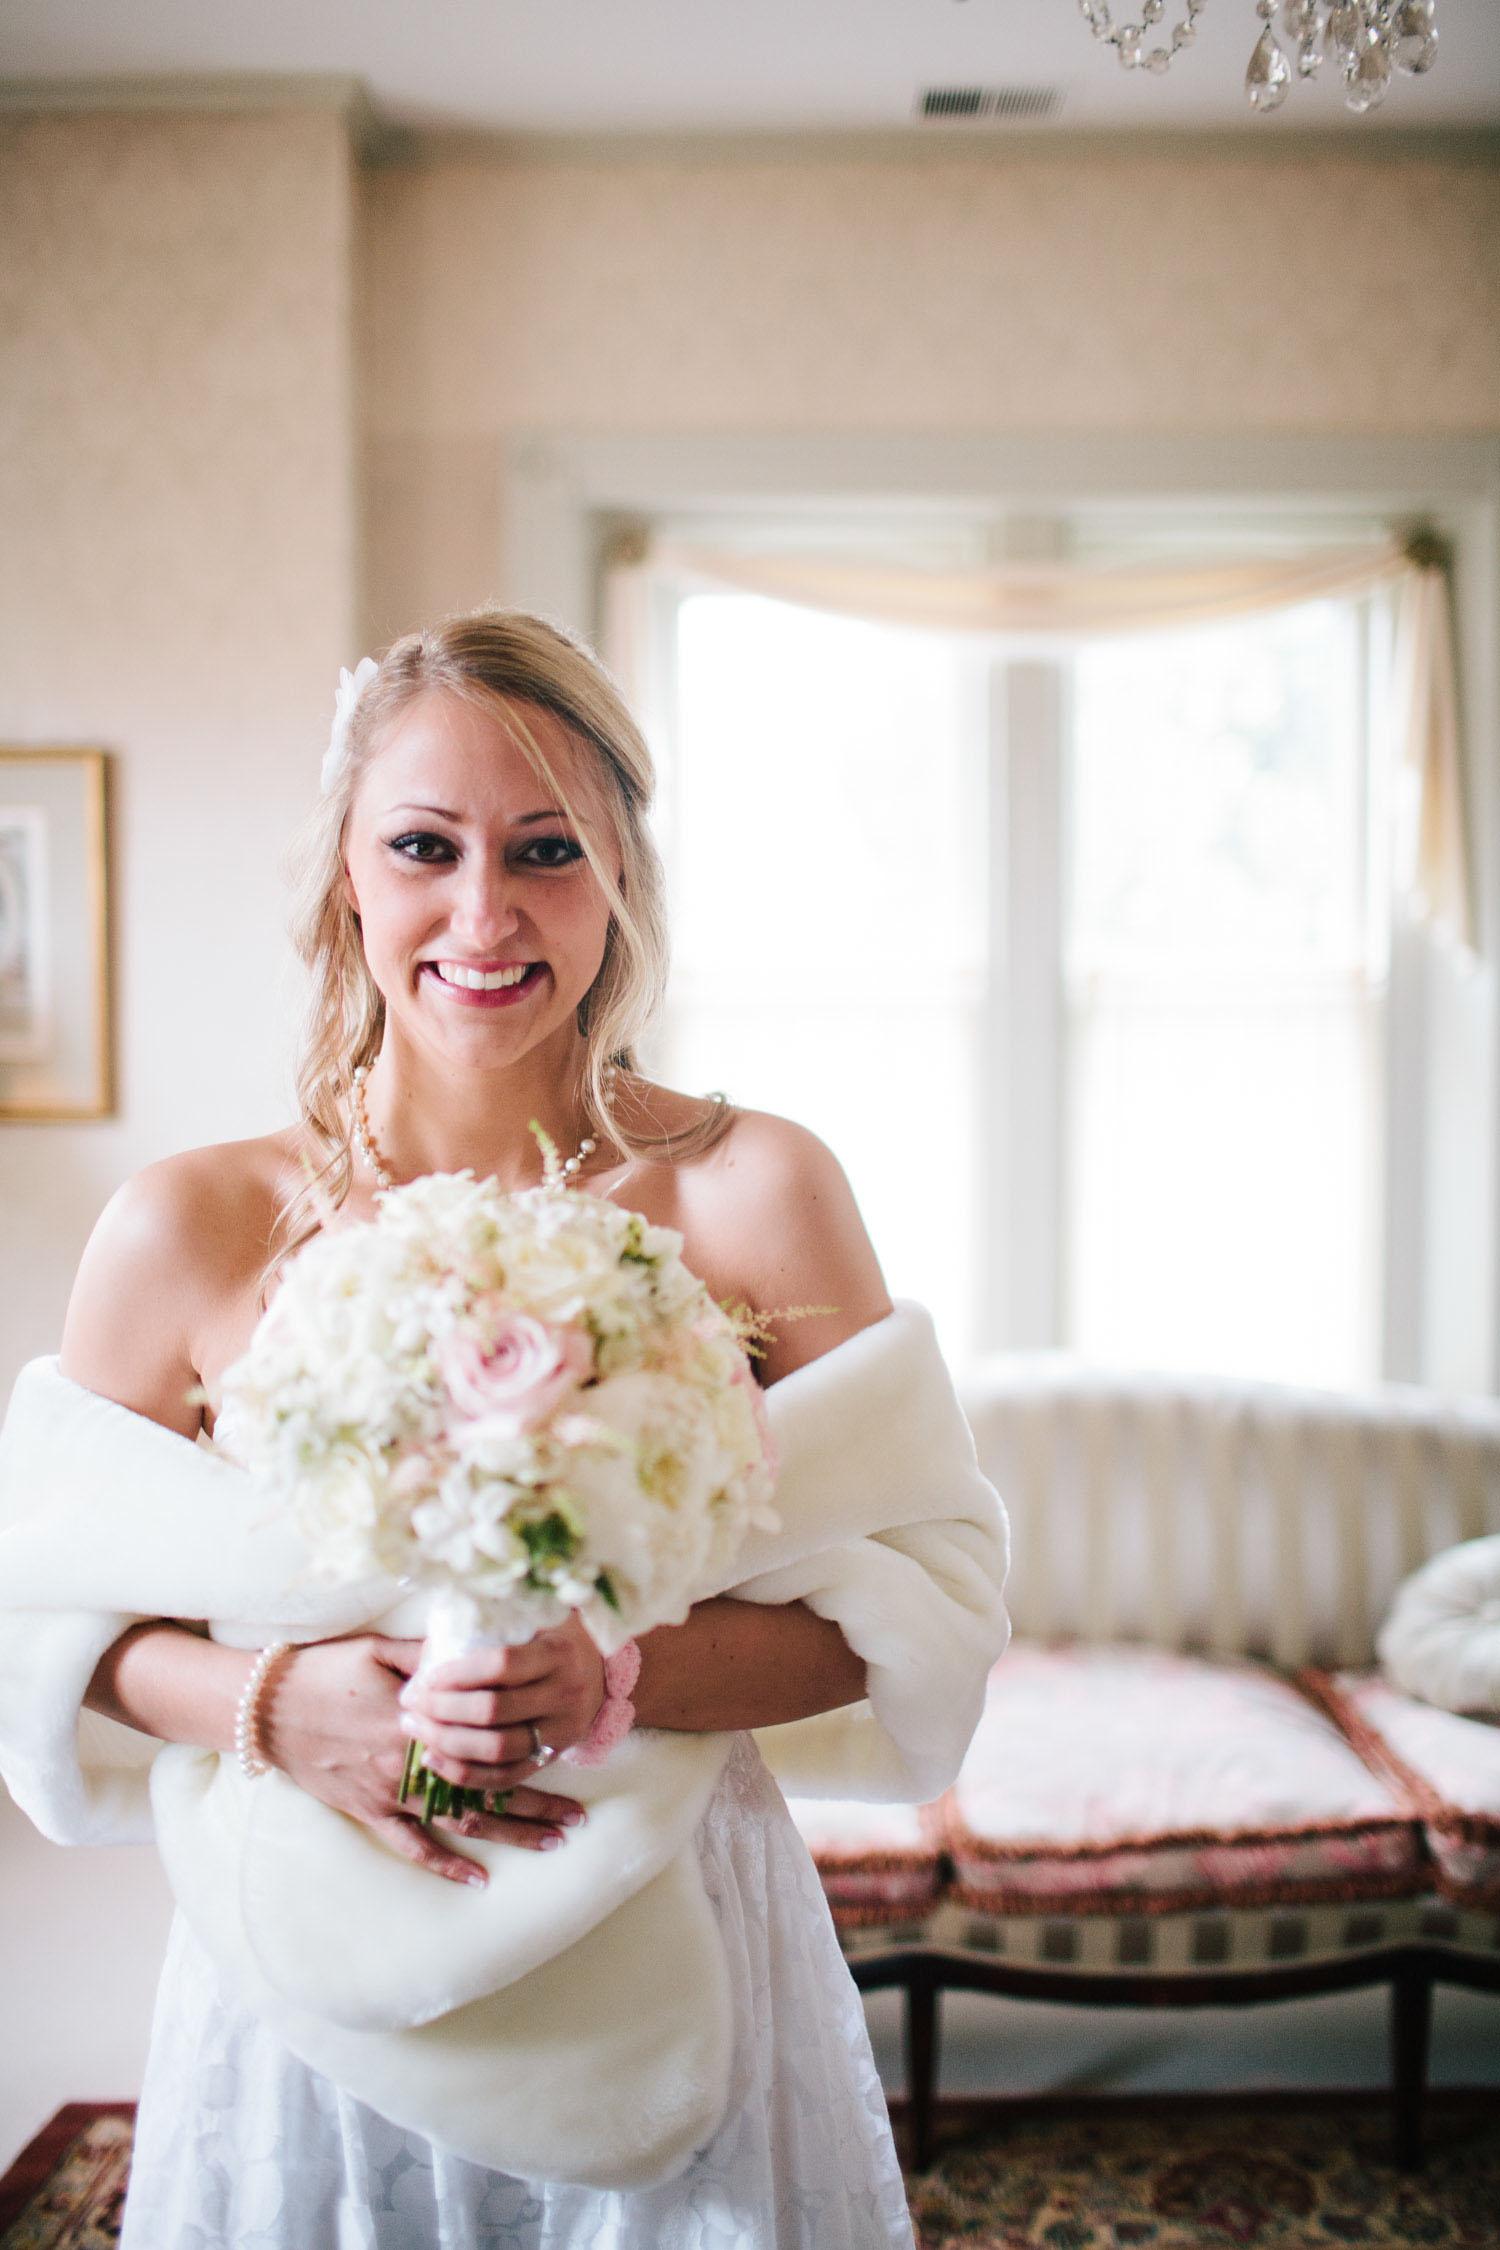 youngstrom-wedding-47.jpg